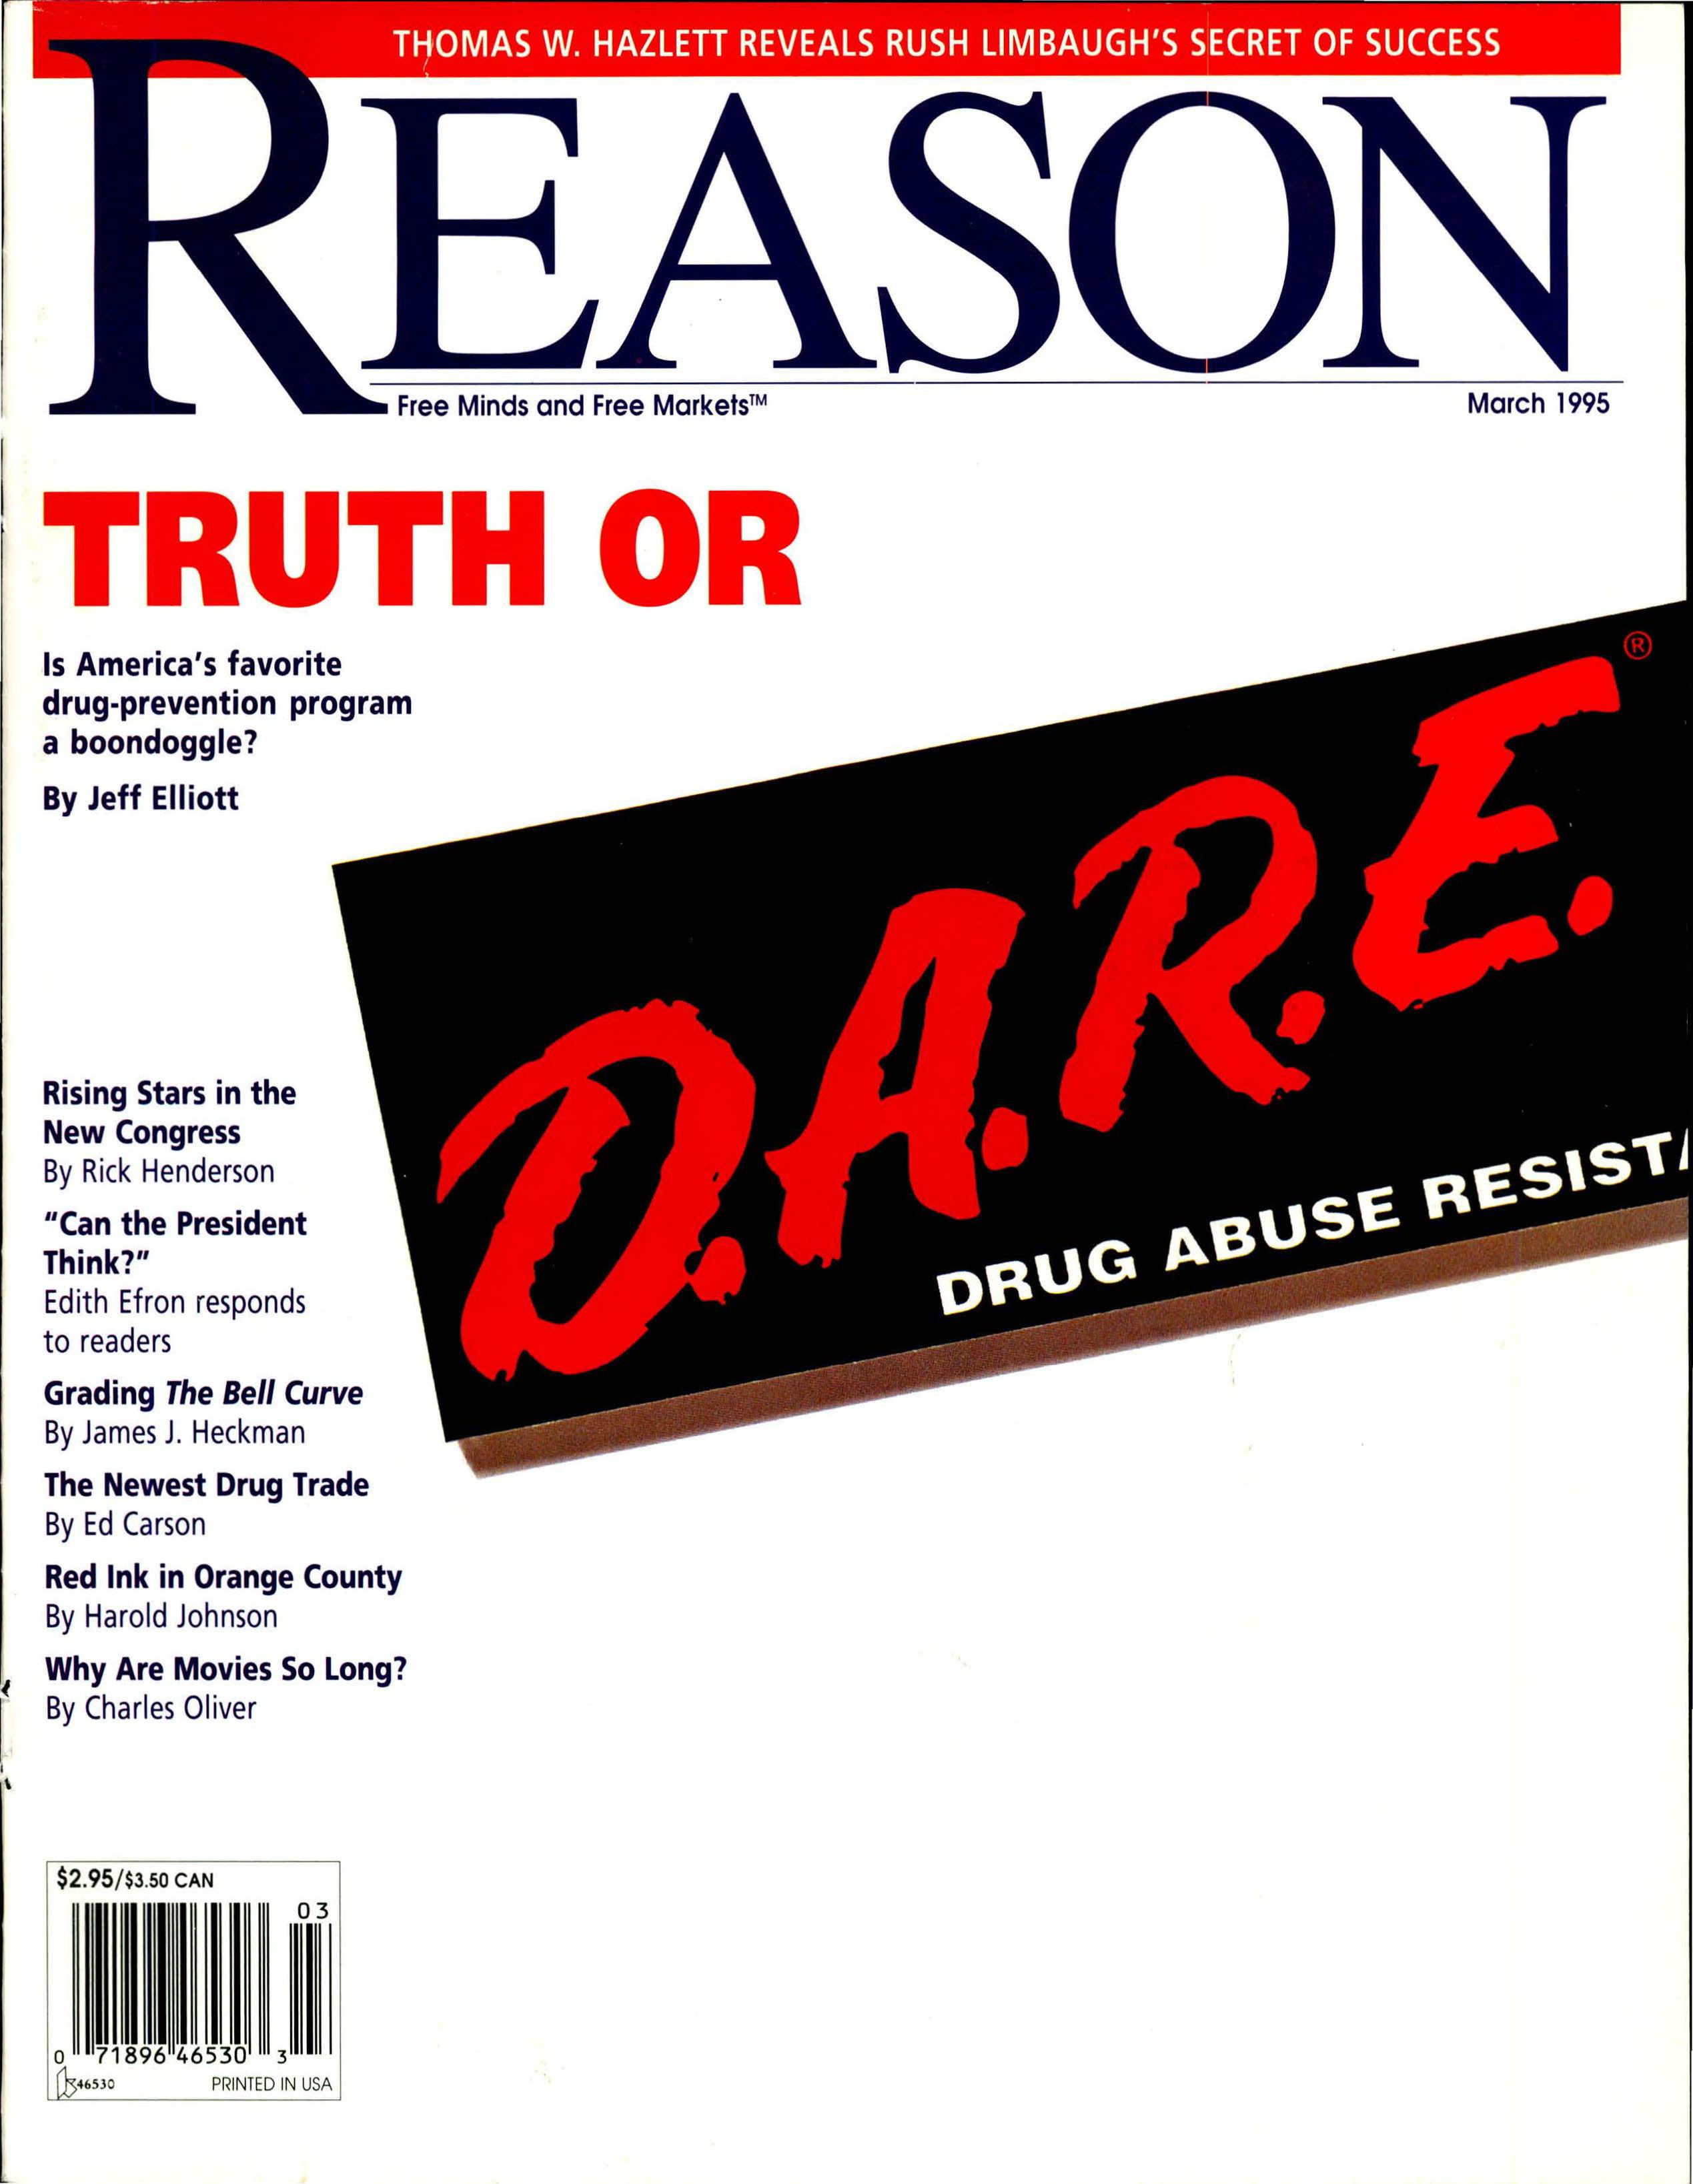 Reason Magazine, March 1995 cover image